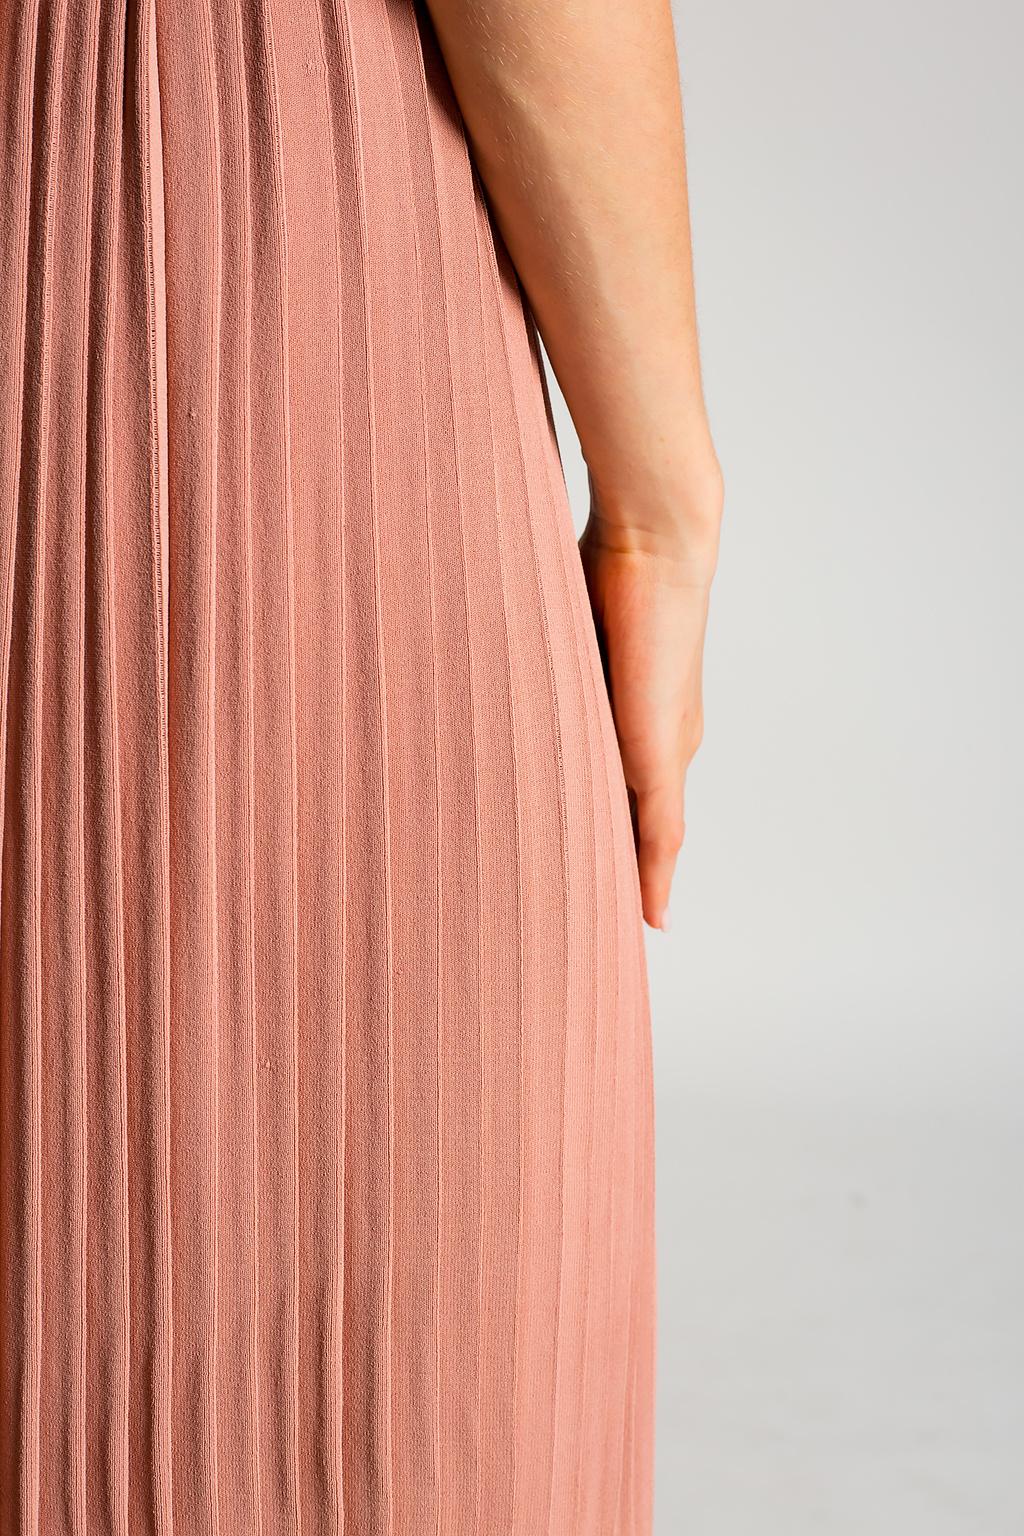 Alaia Slip dress